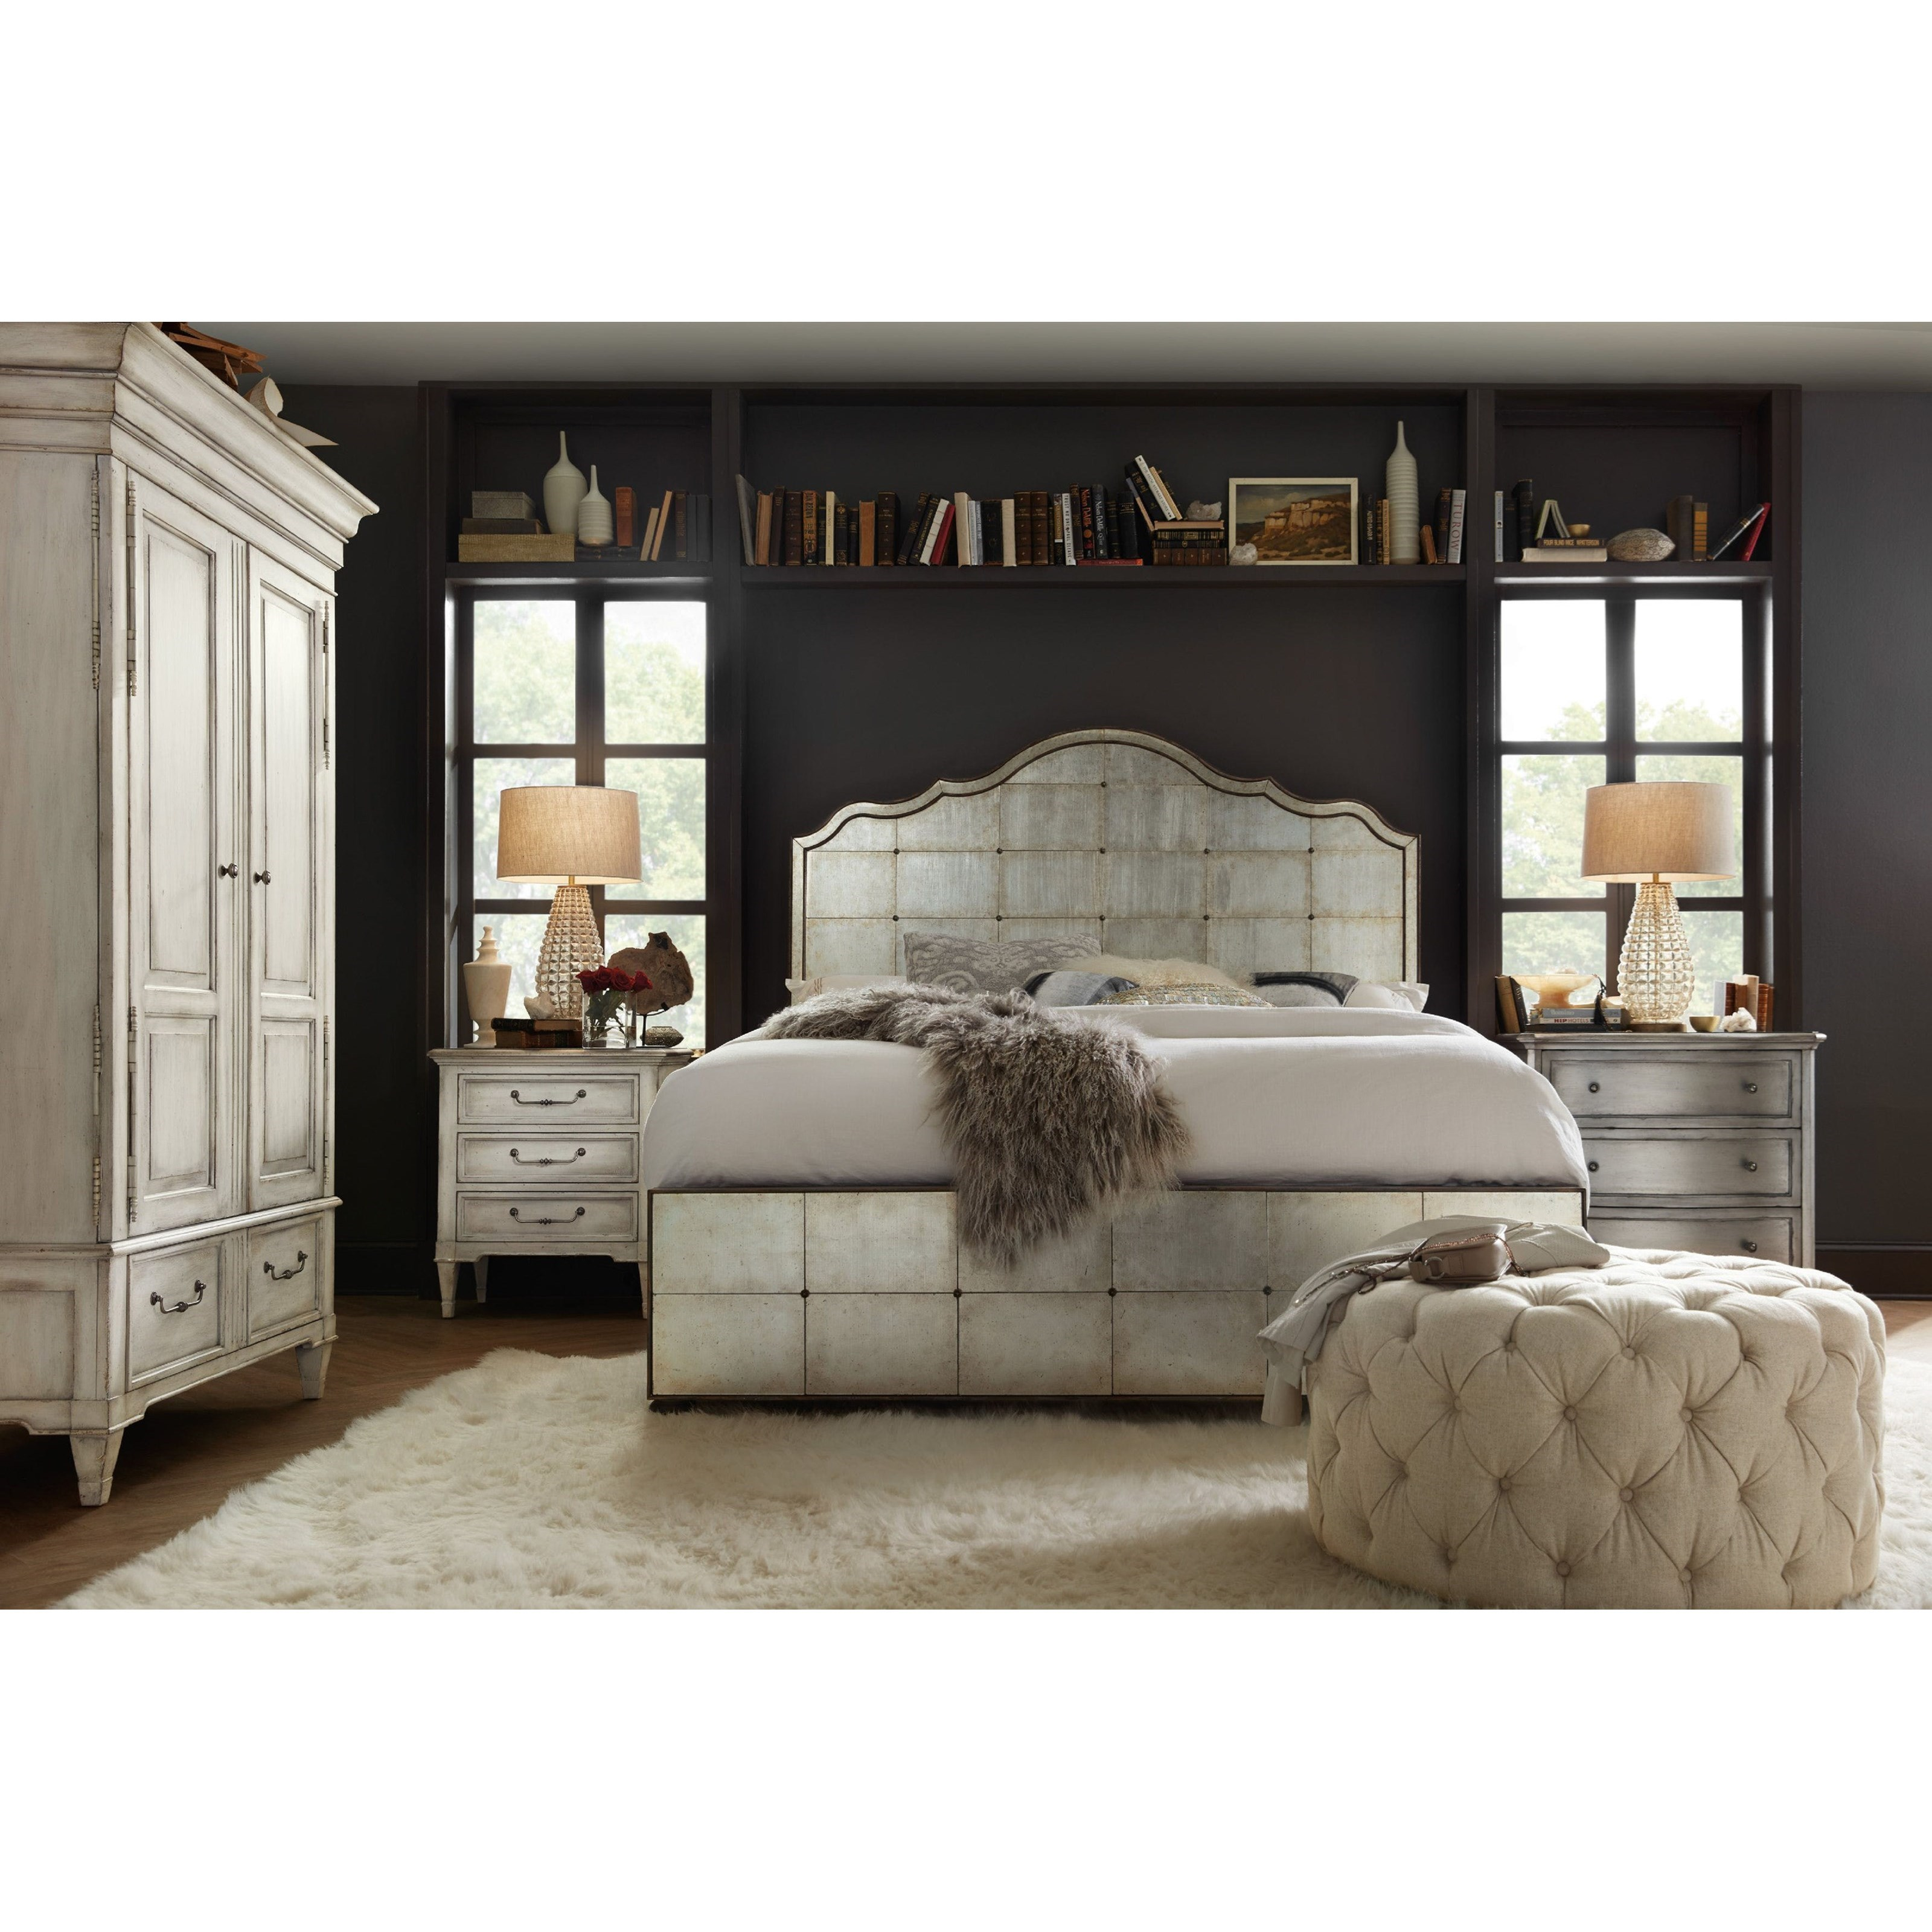 Arabella Queen Bedroom Group by Hooker Furniture at Baer's Furniture